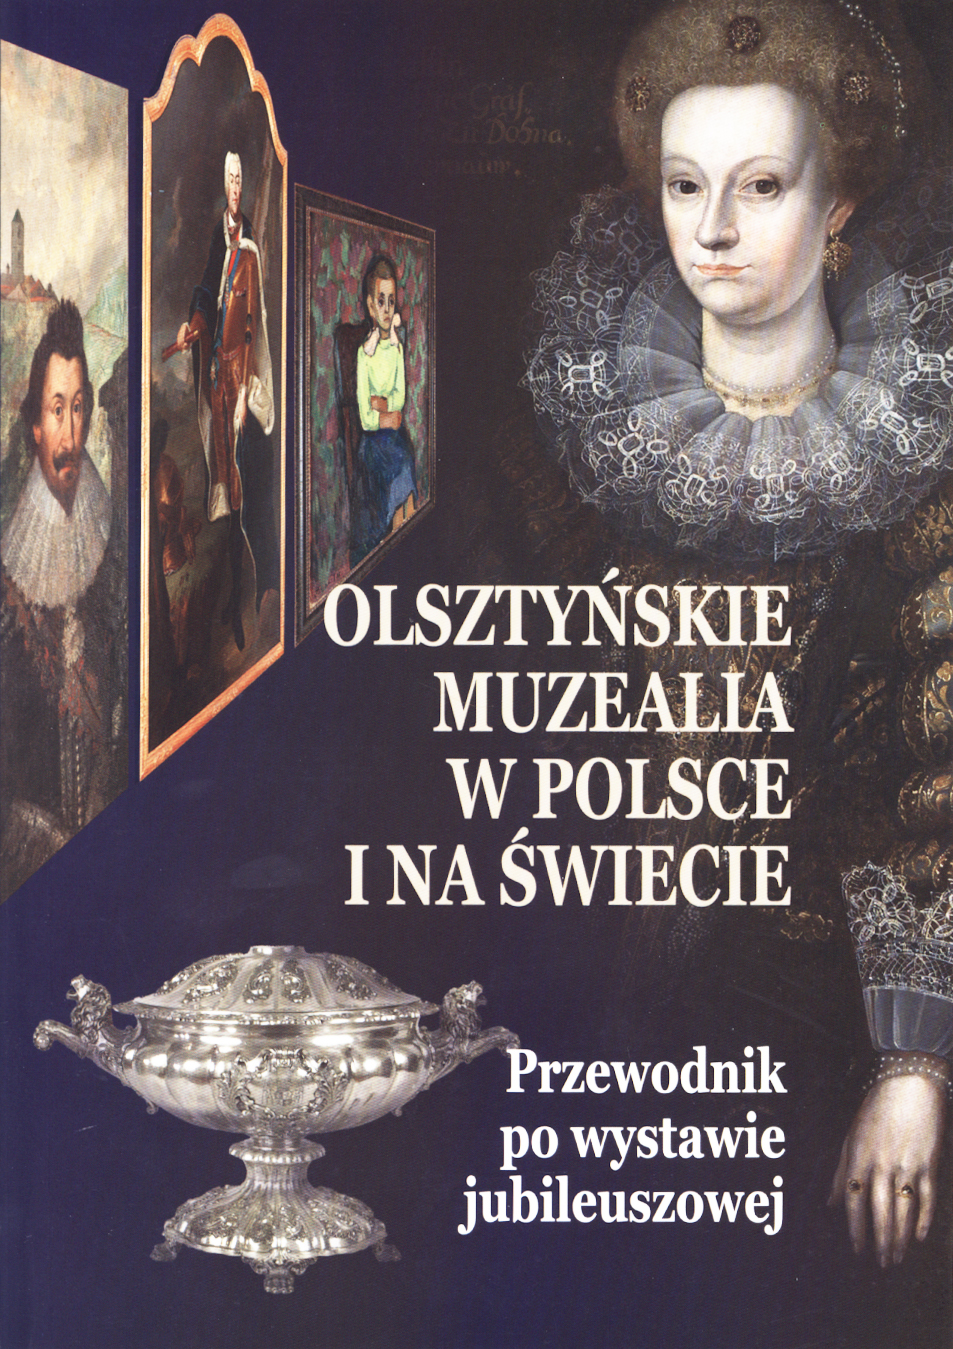 https://m.wmwm.pl/2016/02/orig/olsztynskie-muzealia-5023.jpg